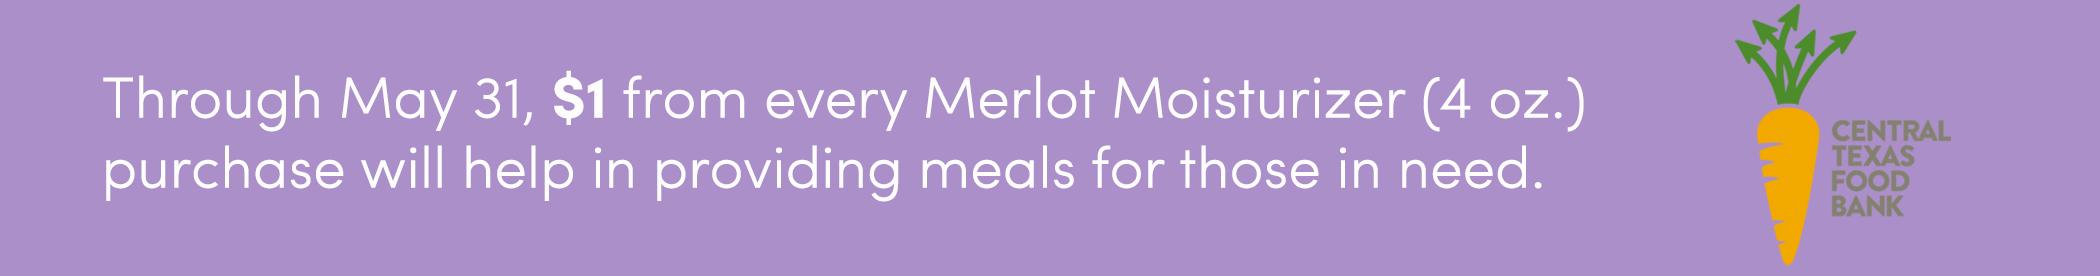 merlot-moisturizer-central-texas-food-bank.jpg